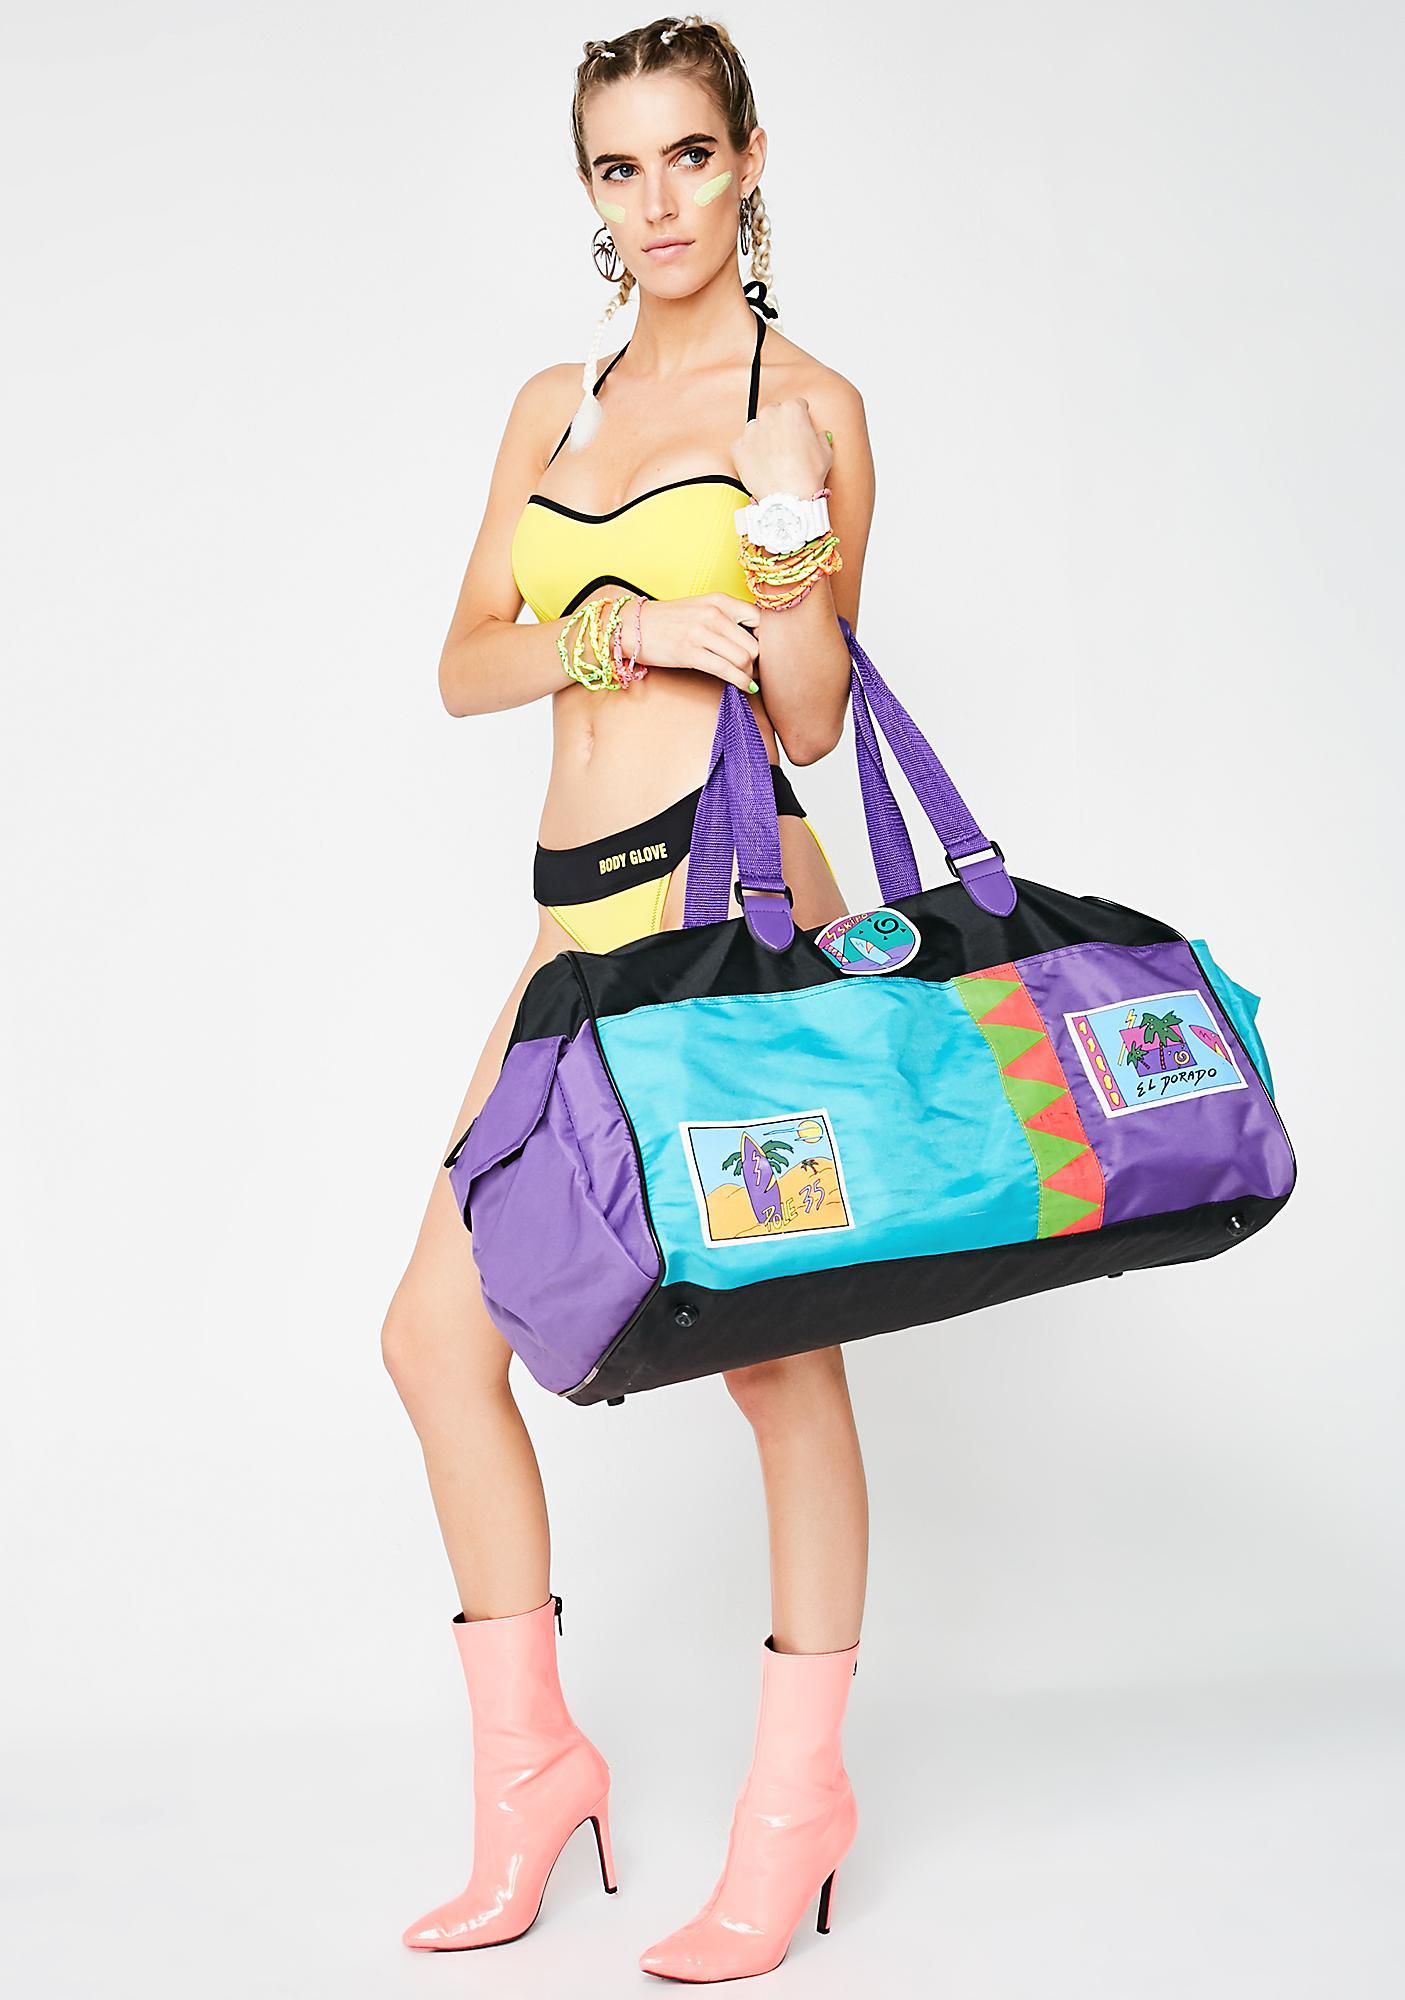 Vintage 80s Neon Duffle Bag